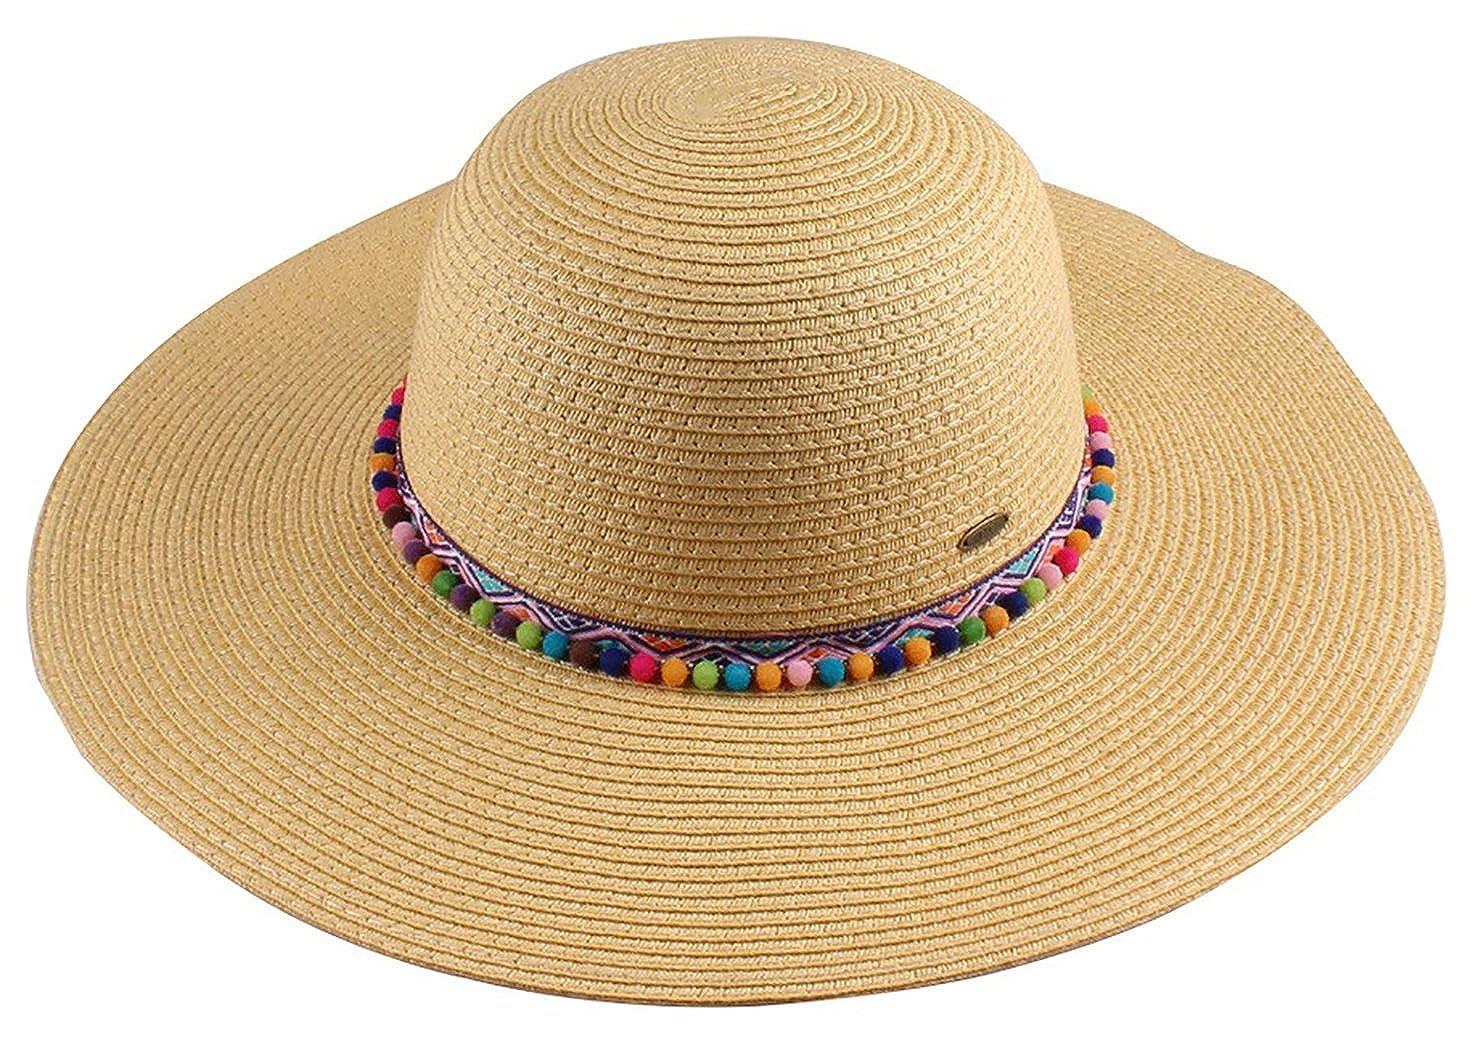 b406d7015dec02 H-2019-06 Embellished Floppy Beach Foldable Packable Sun Hat - Black Tassel  at Amazon Women's Clothing store: